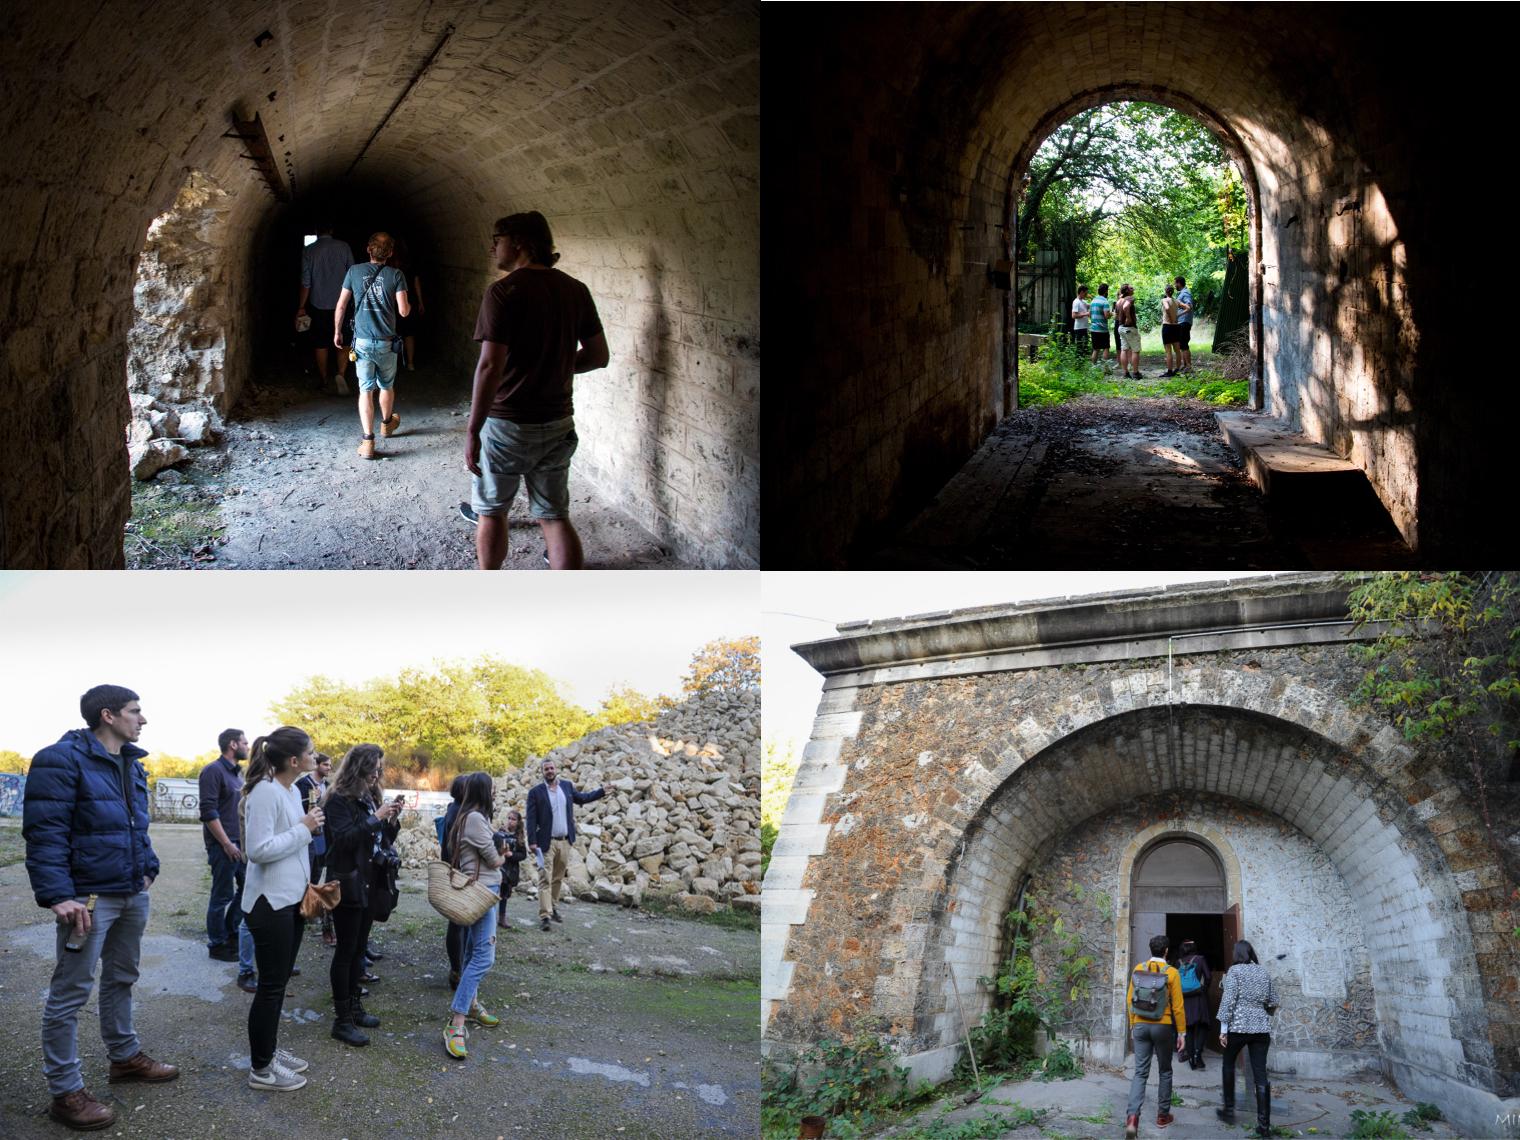 Fort_Experiences-1478711940.jpg